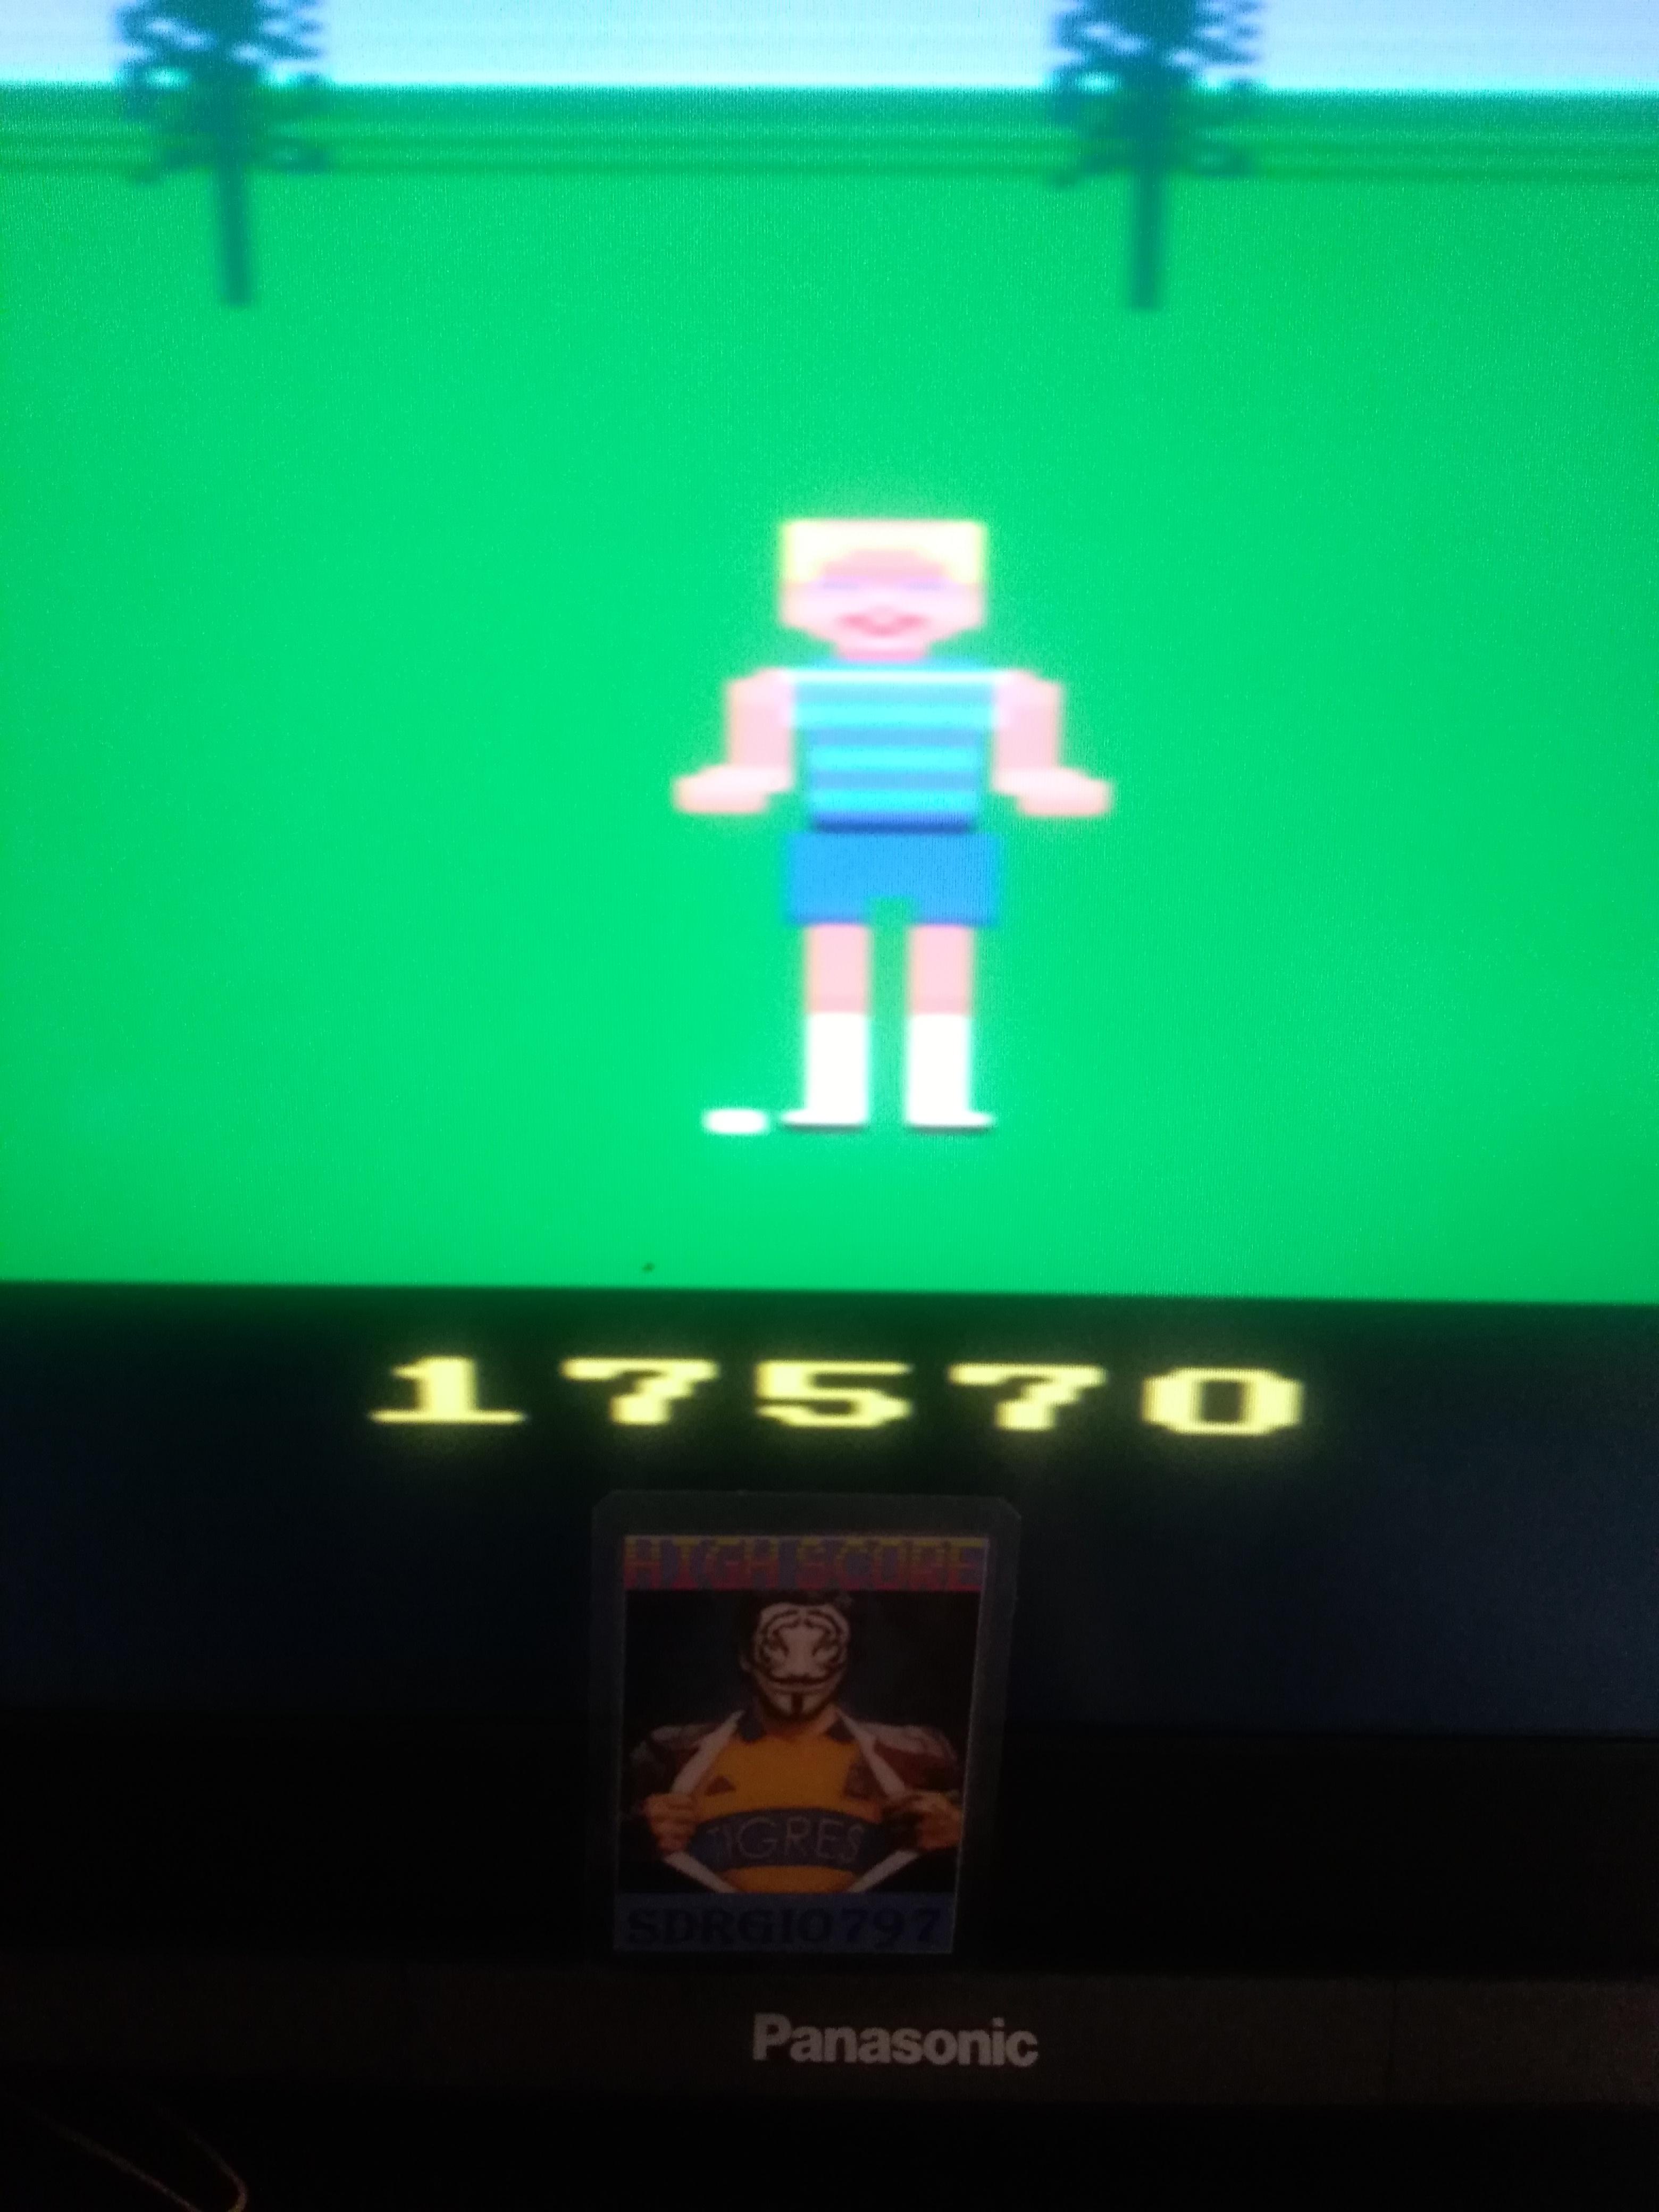 Sdrgio797: California Games: Foot Bag (Atari 2600 Emulated) 17,570 points on 2021-05-01 18:49:12